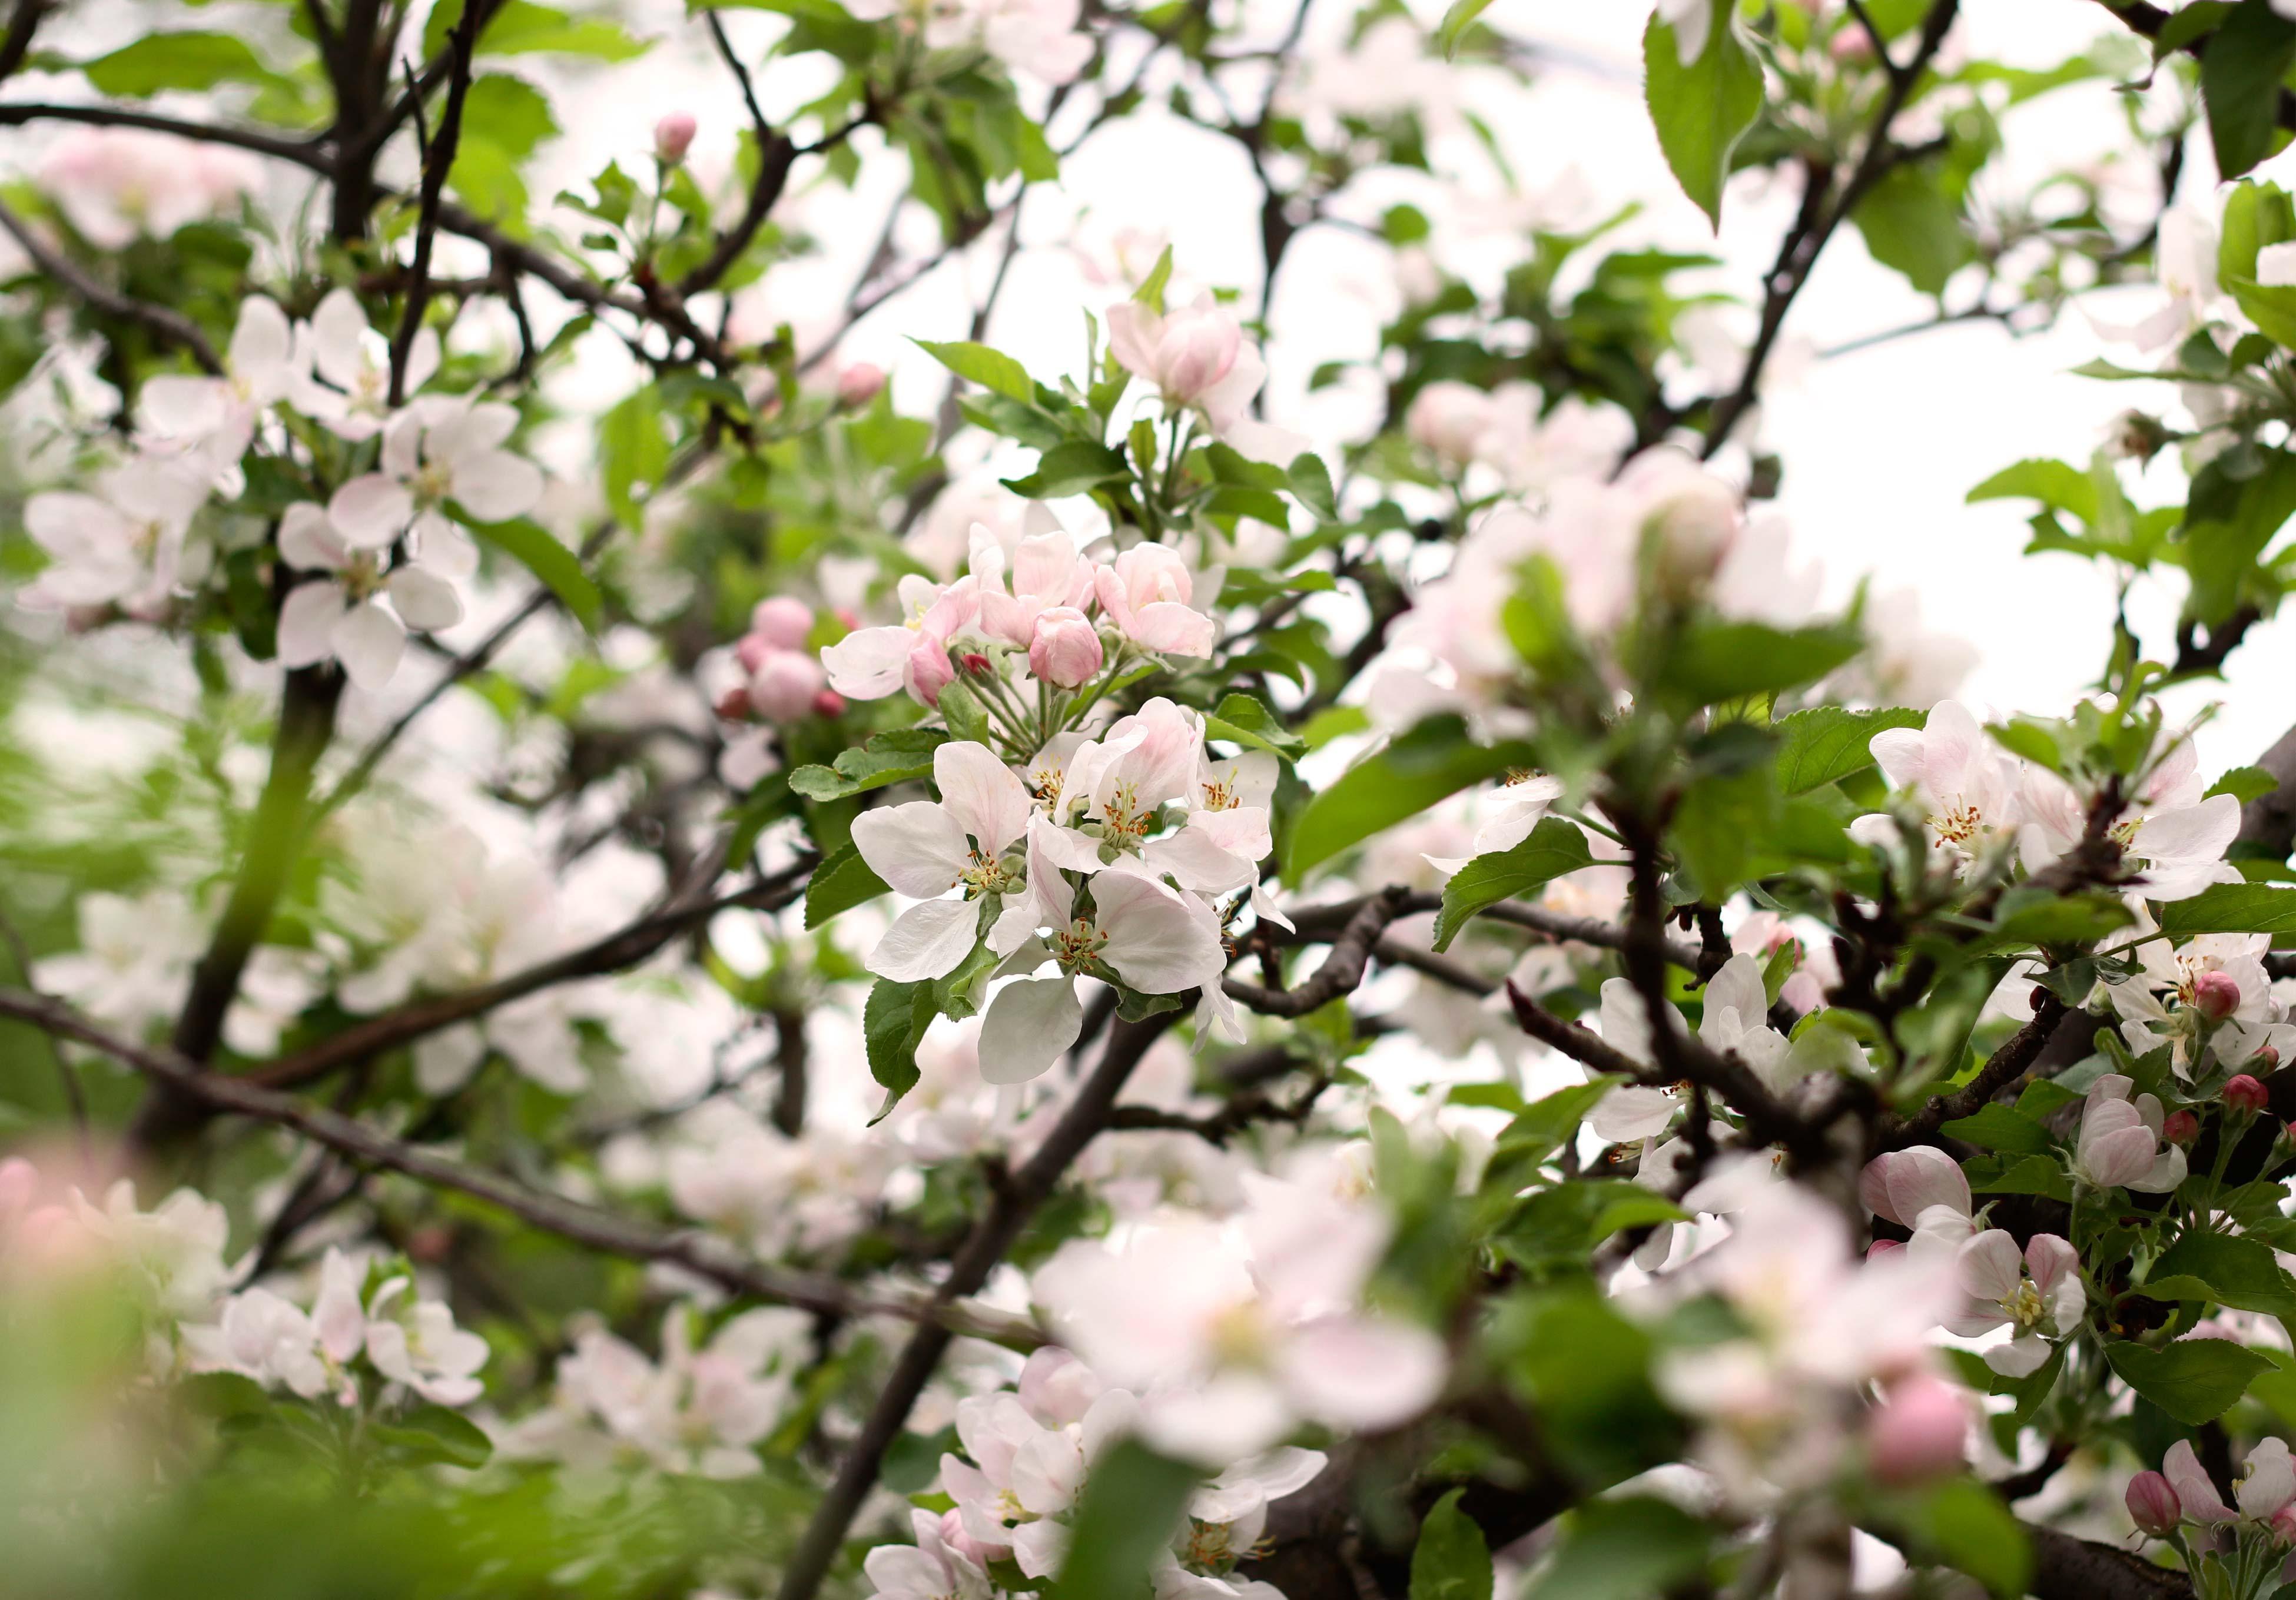 viragzik_az_alma_apple_blooming_csige_ke